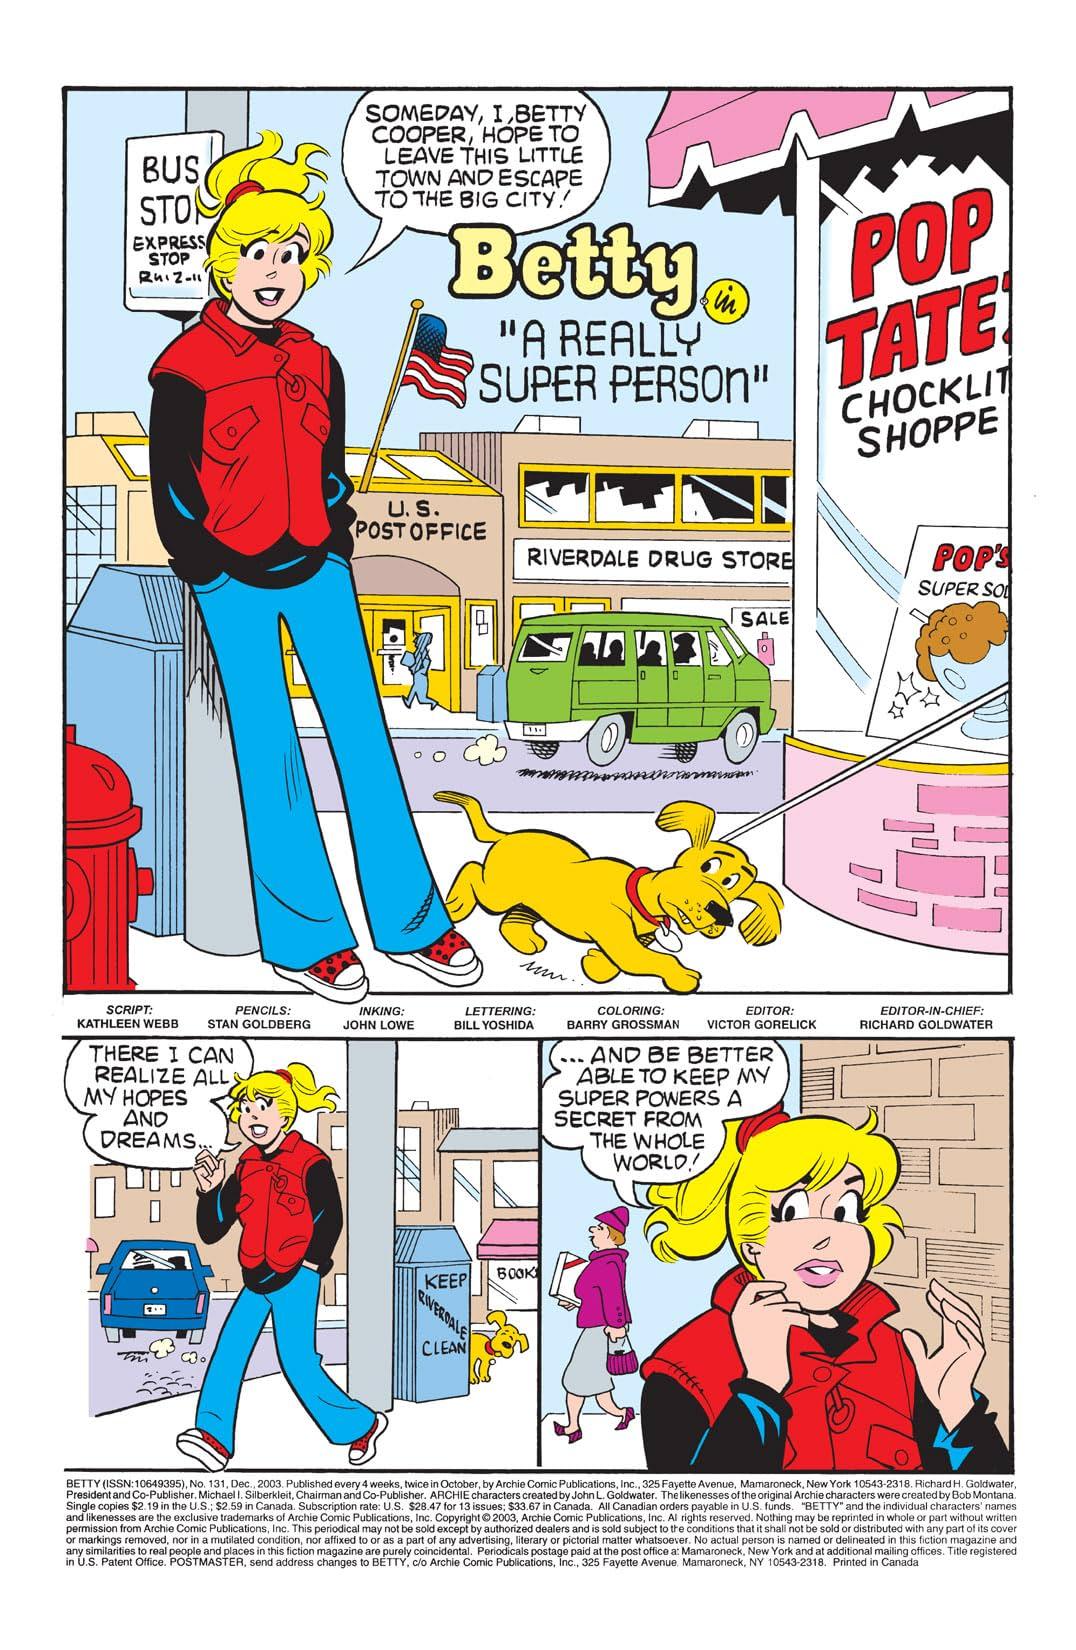 Betty #131